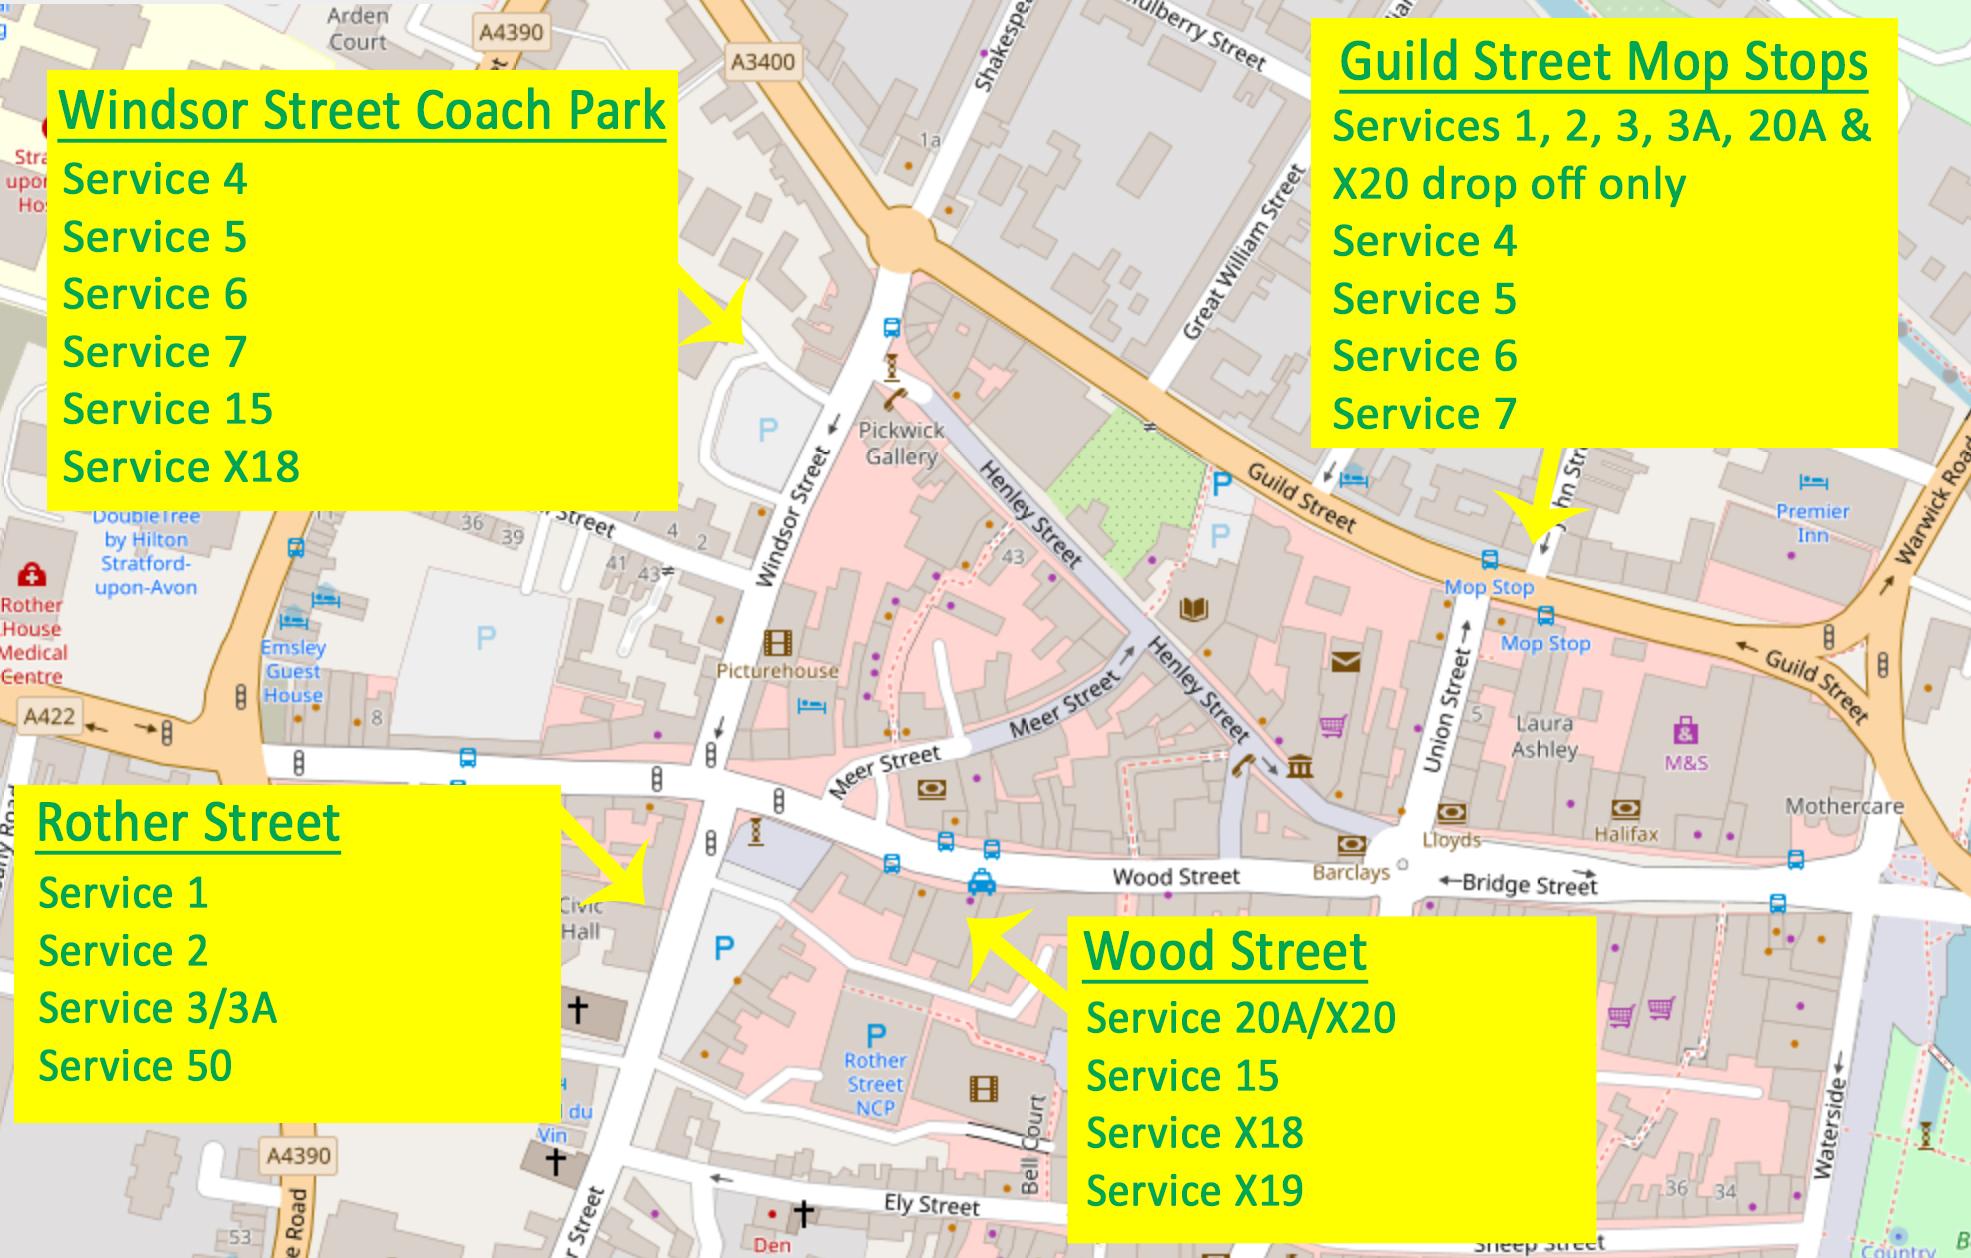 Stratford upon Avon temporary bus stops